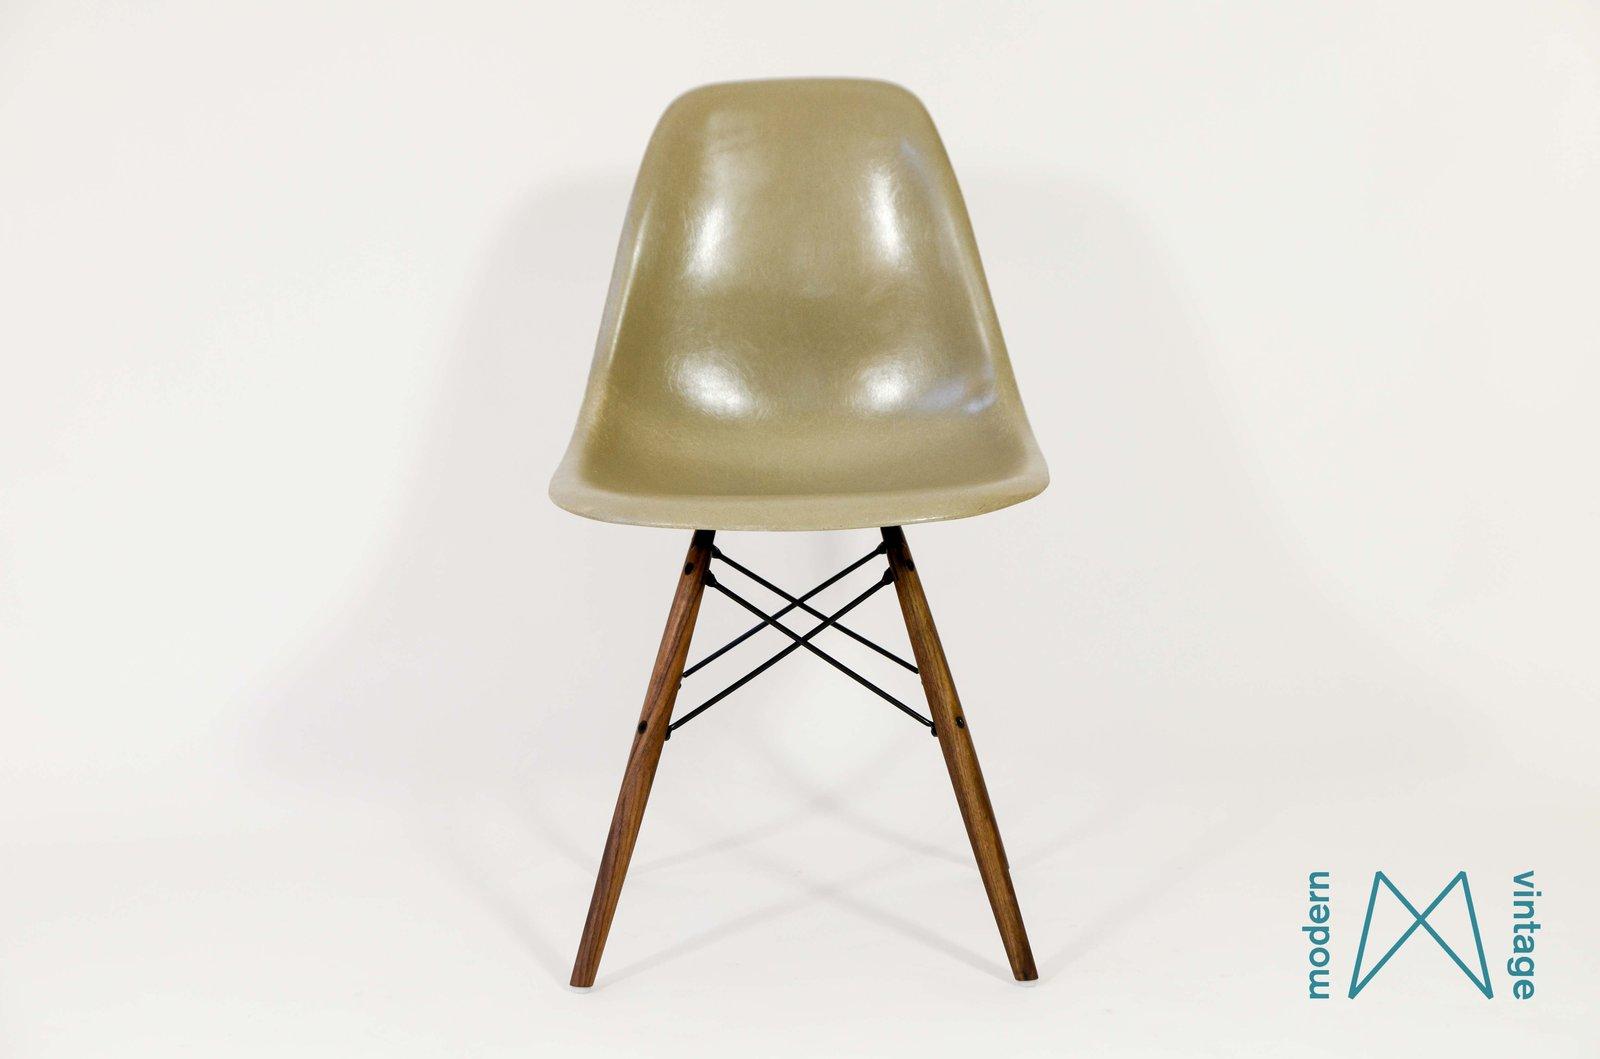 Modern Vintage Amsterdam Original Eames Furniture — Products